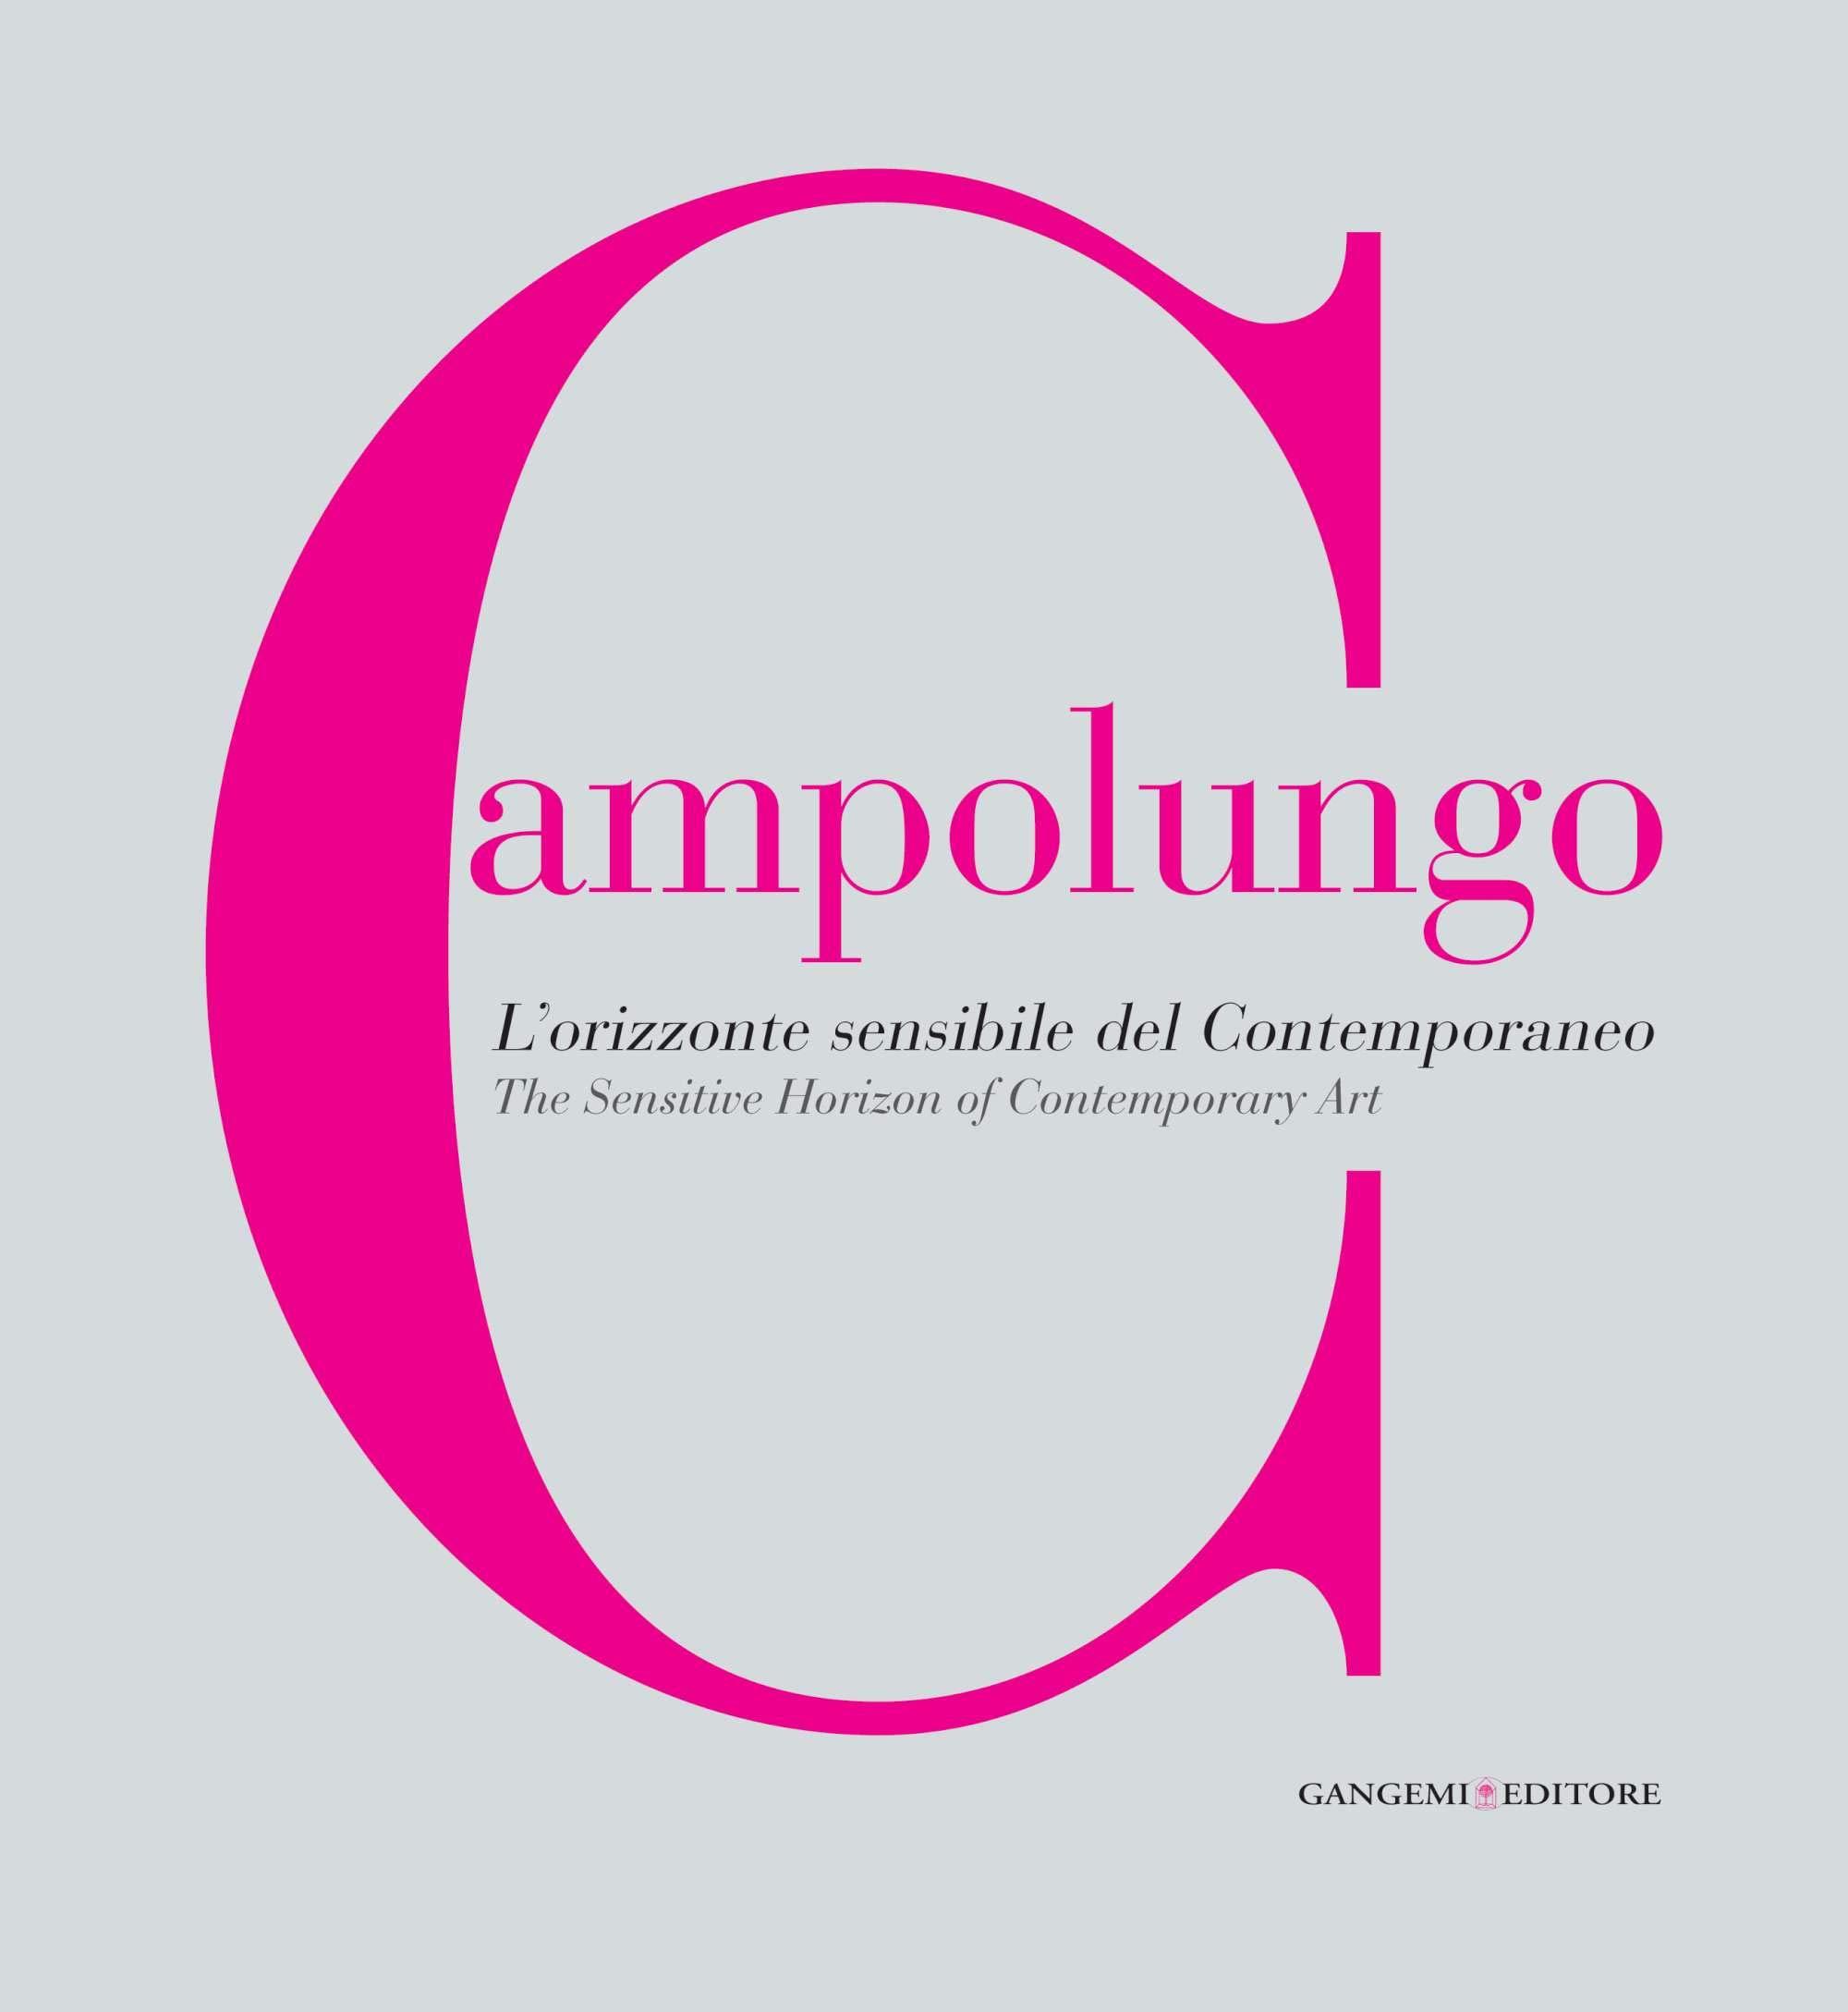 Campolungo: The Sensitive Horizon of Contemporary Art pdf